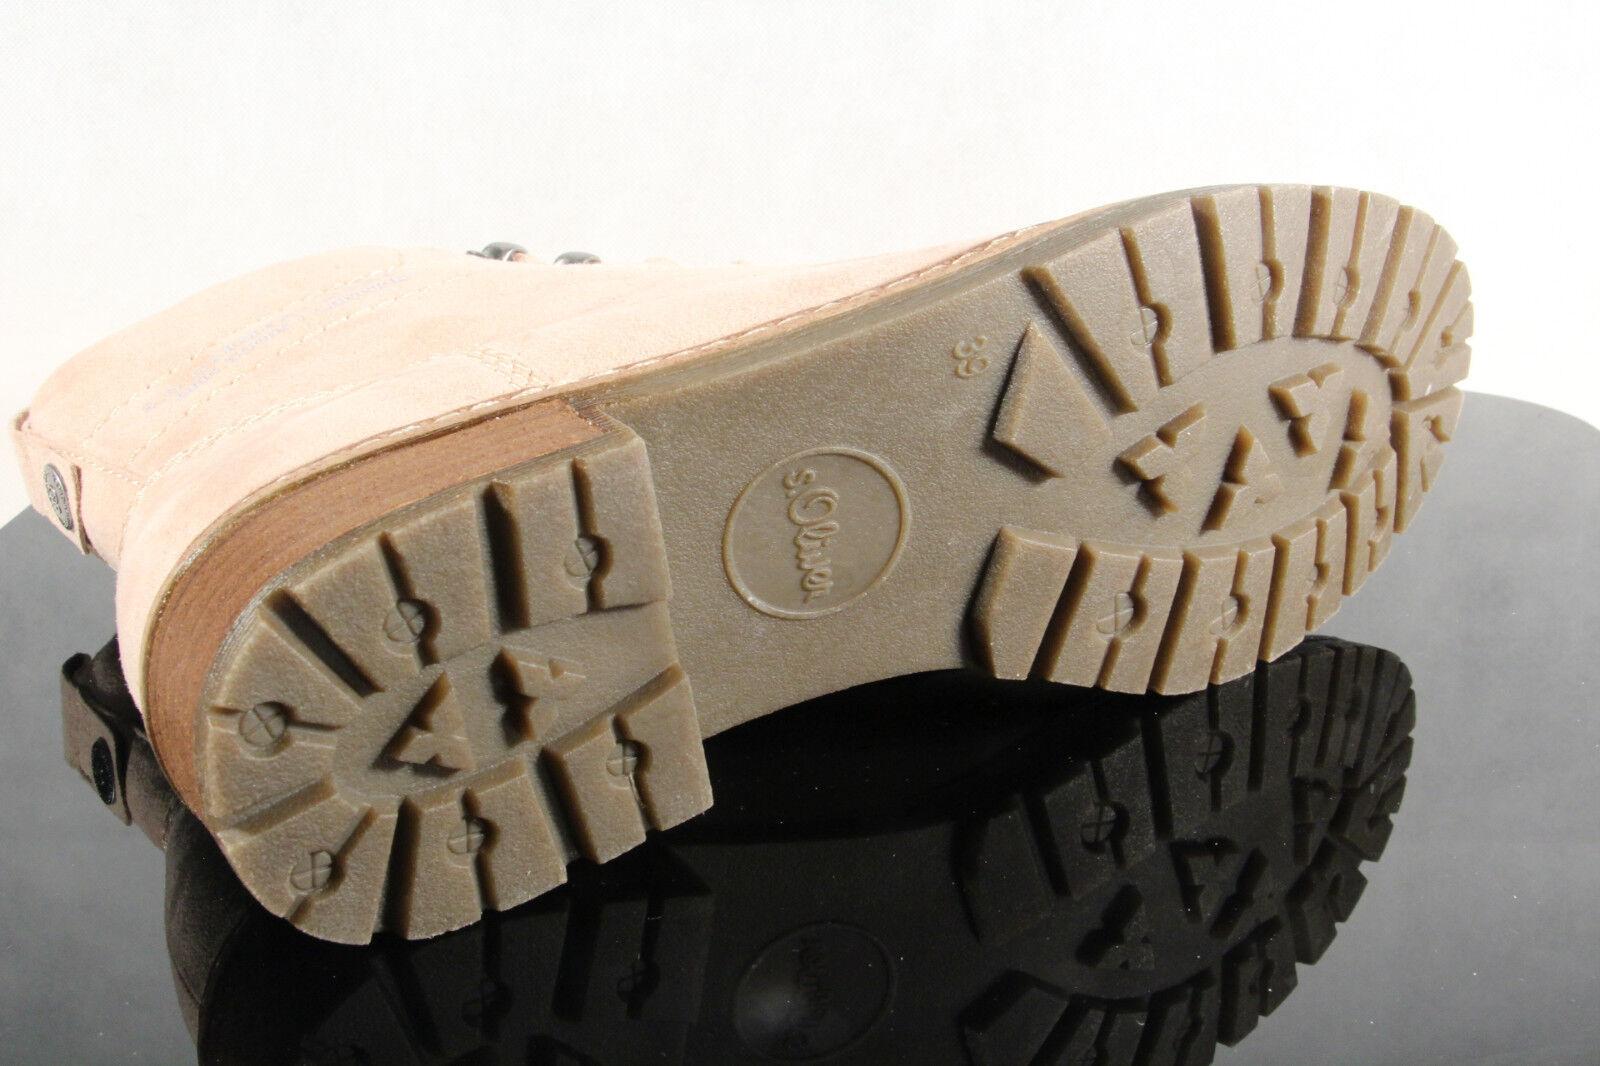 S.OLIVER botas de Cordón Botines Botines Botines botas Botines rosado 26212 Nuevo e518be